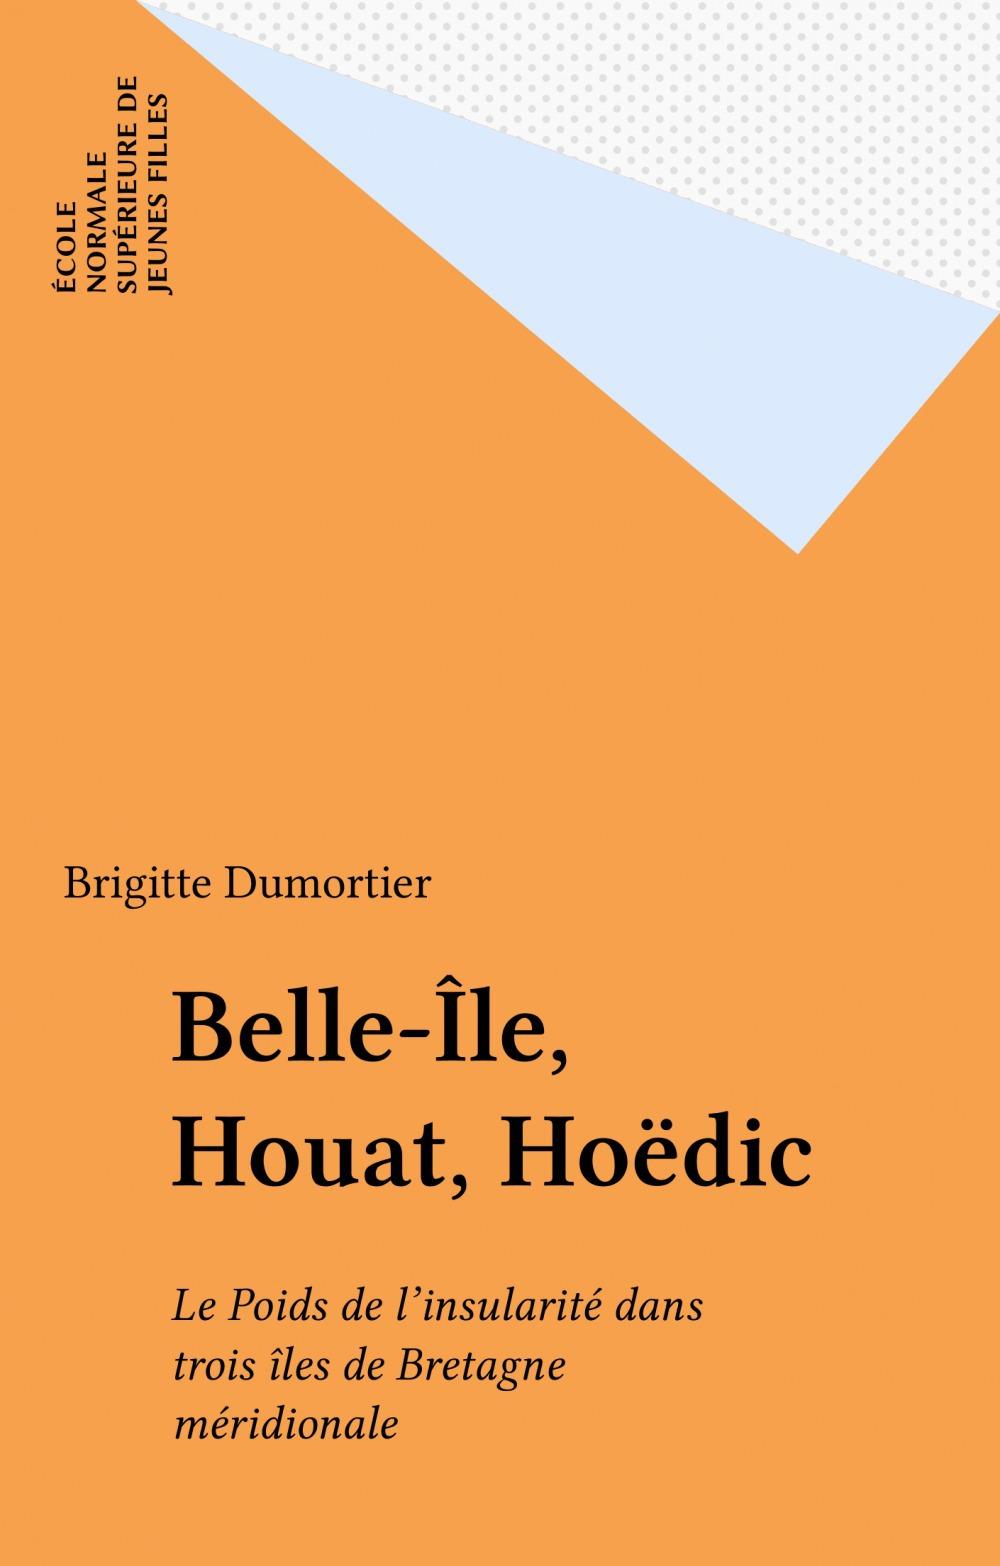 Belle-Île, Houat, Hoëdic